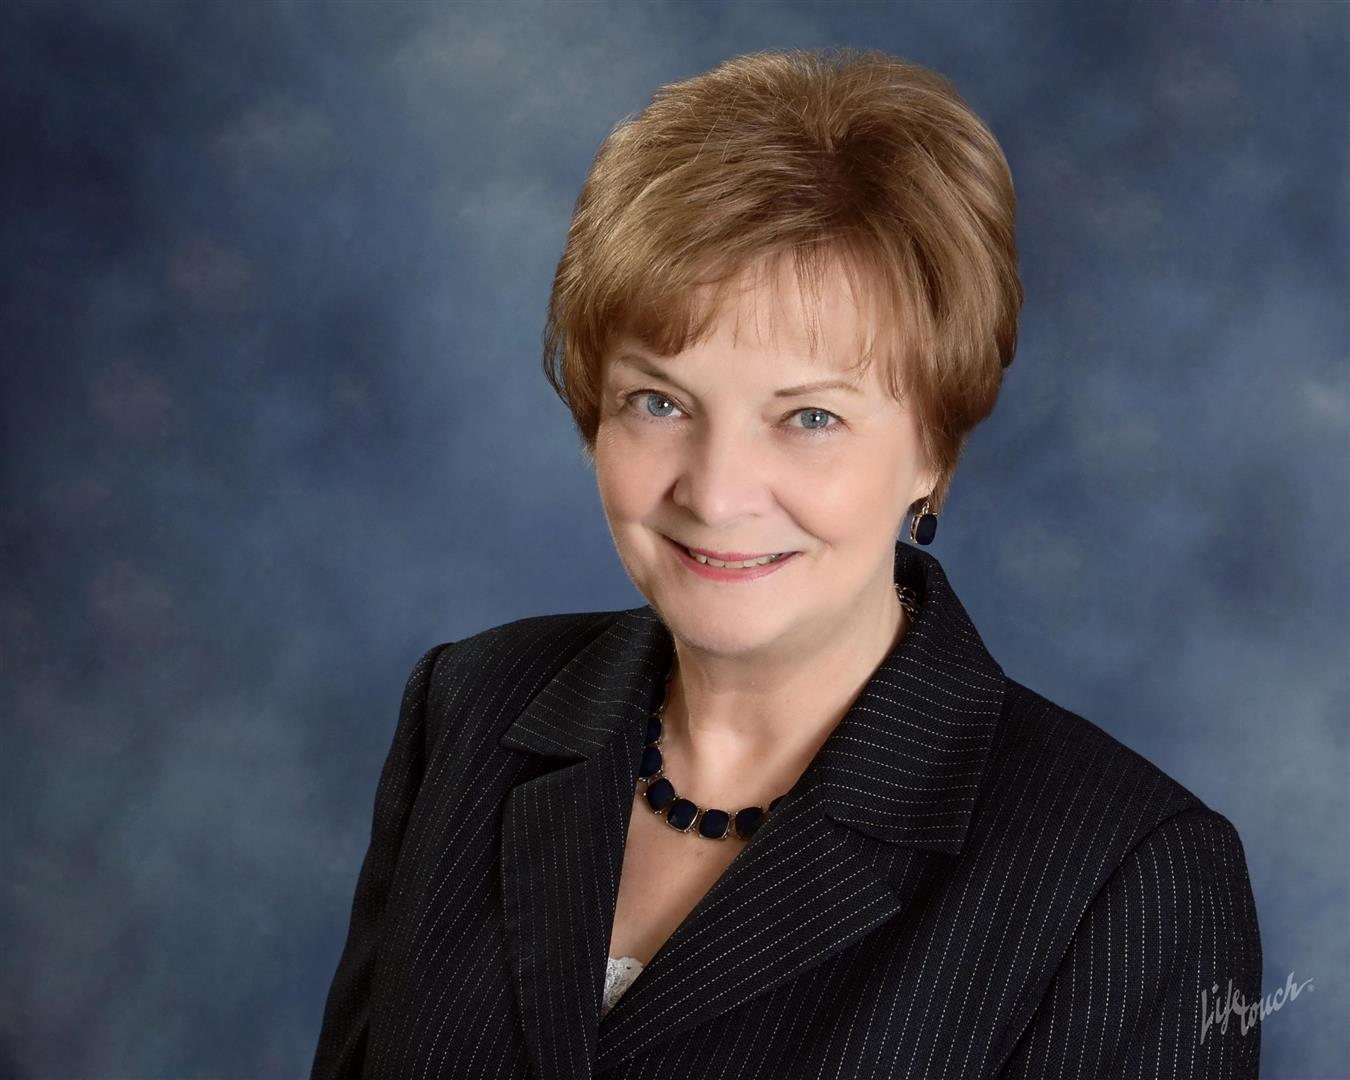 Linda C. Cullen